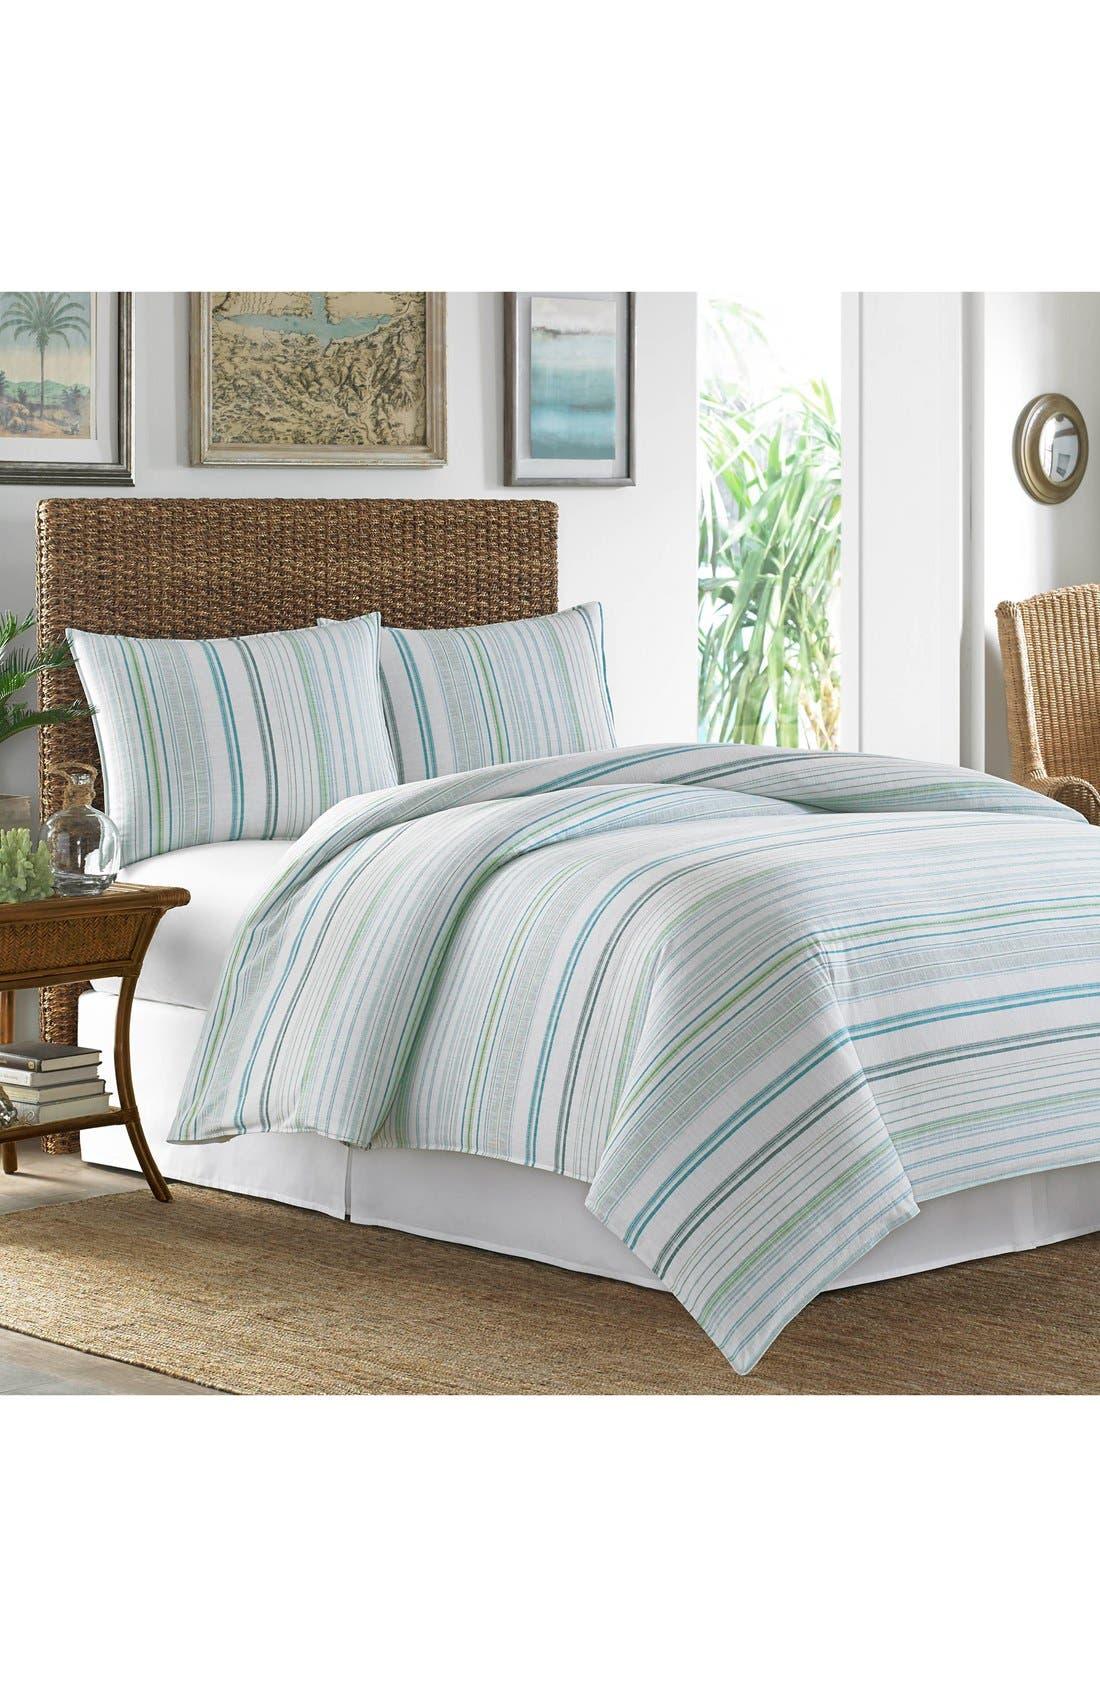 La Scala Breezer Comforter, Sham & Bed Skirt Set,                         Main,                         color, 440